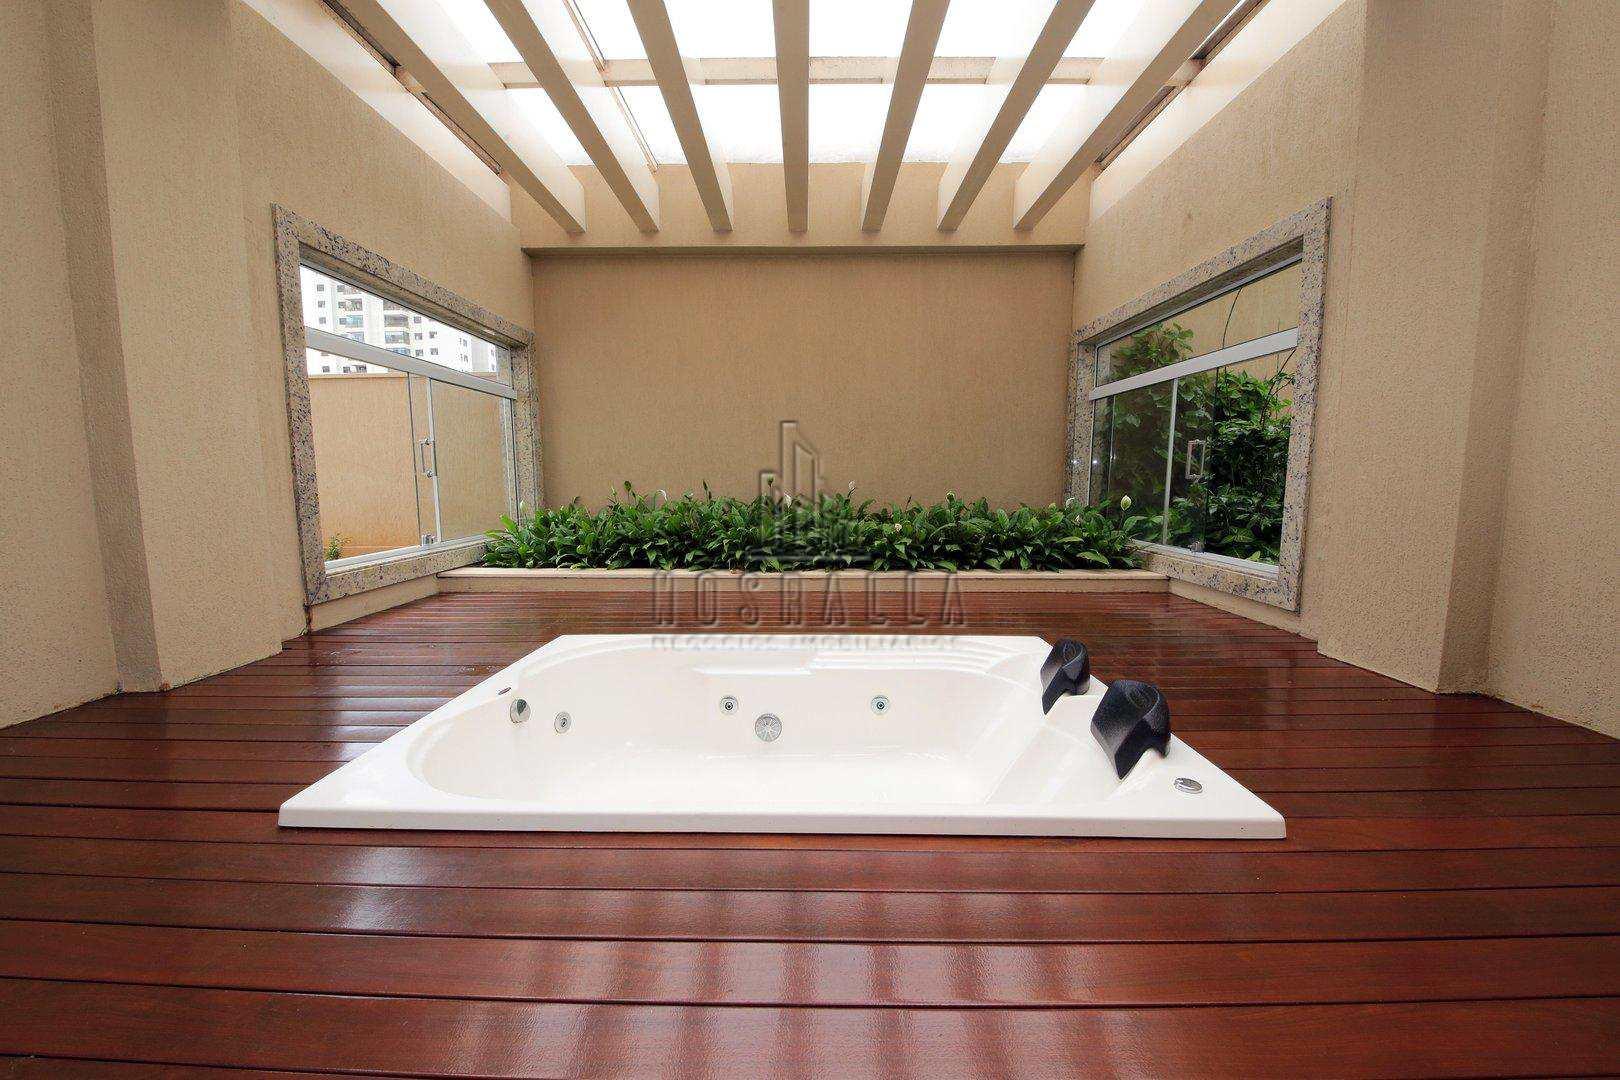 spa-e-sauna-2.JPG.1920x1080_q85